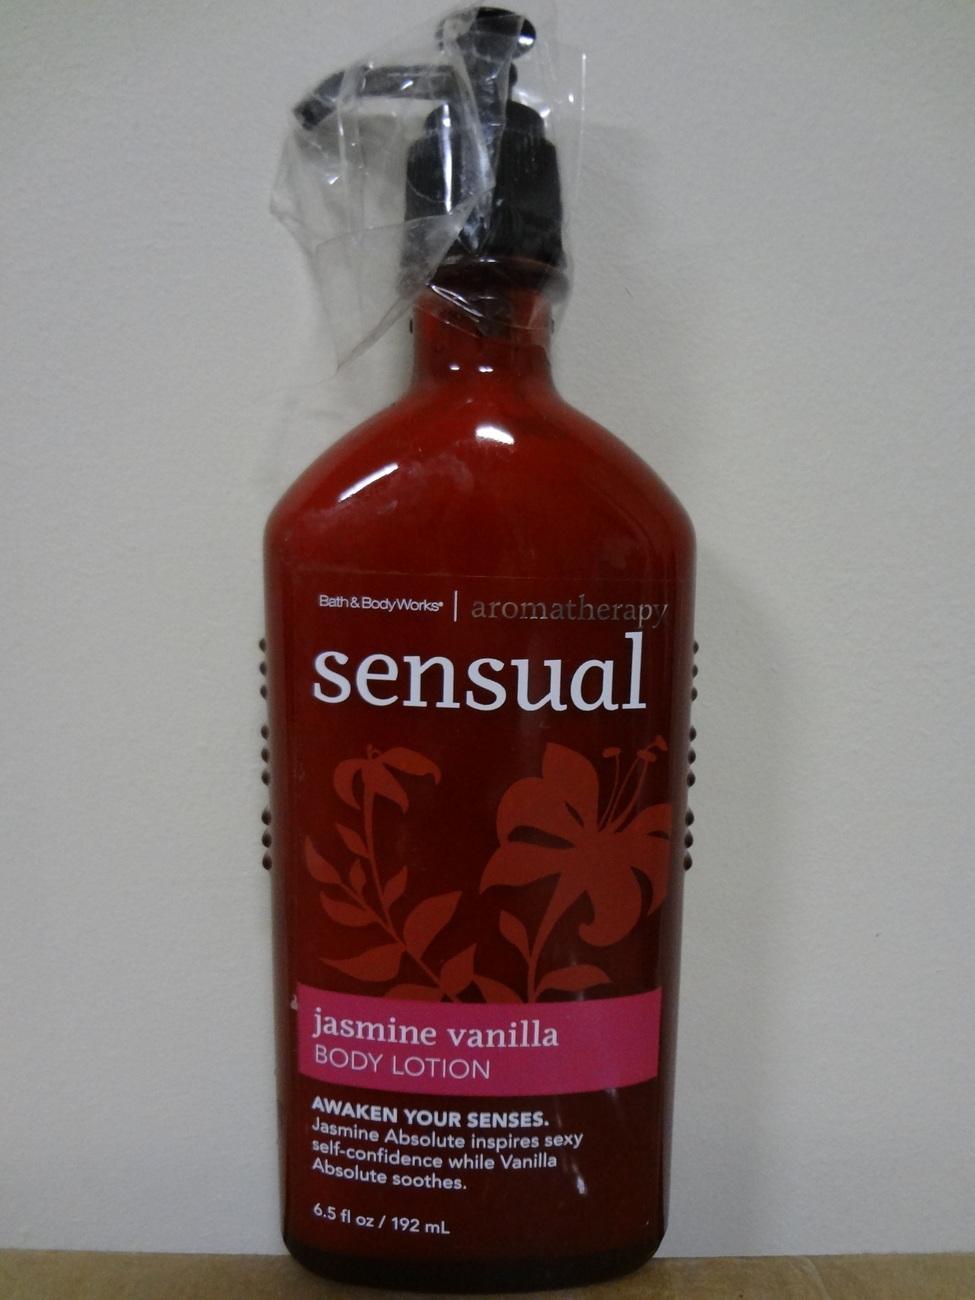 Bath Amp Body Works Aromatherapy Sensual Jasmine Vanilla